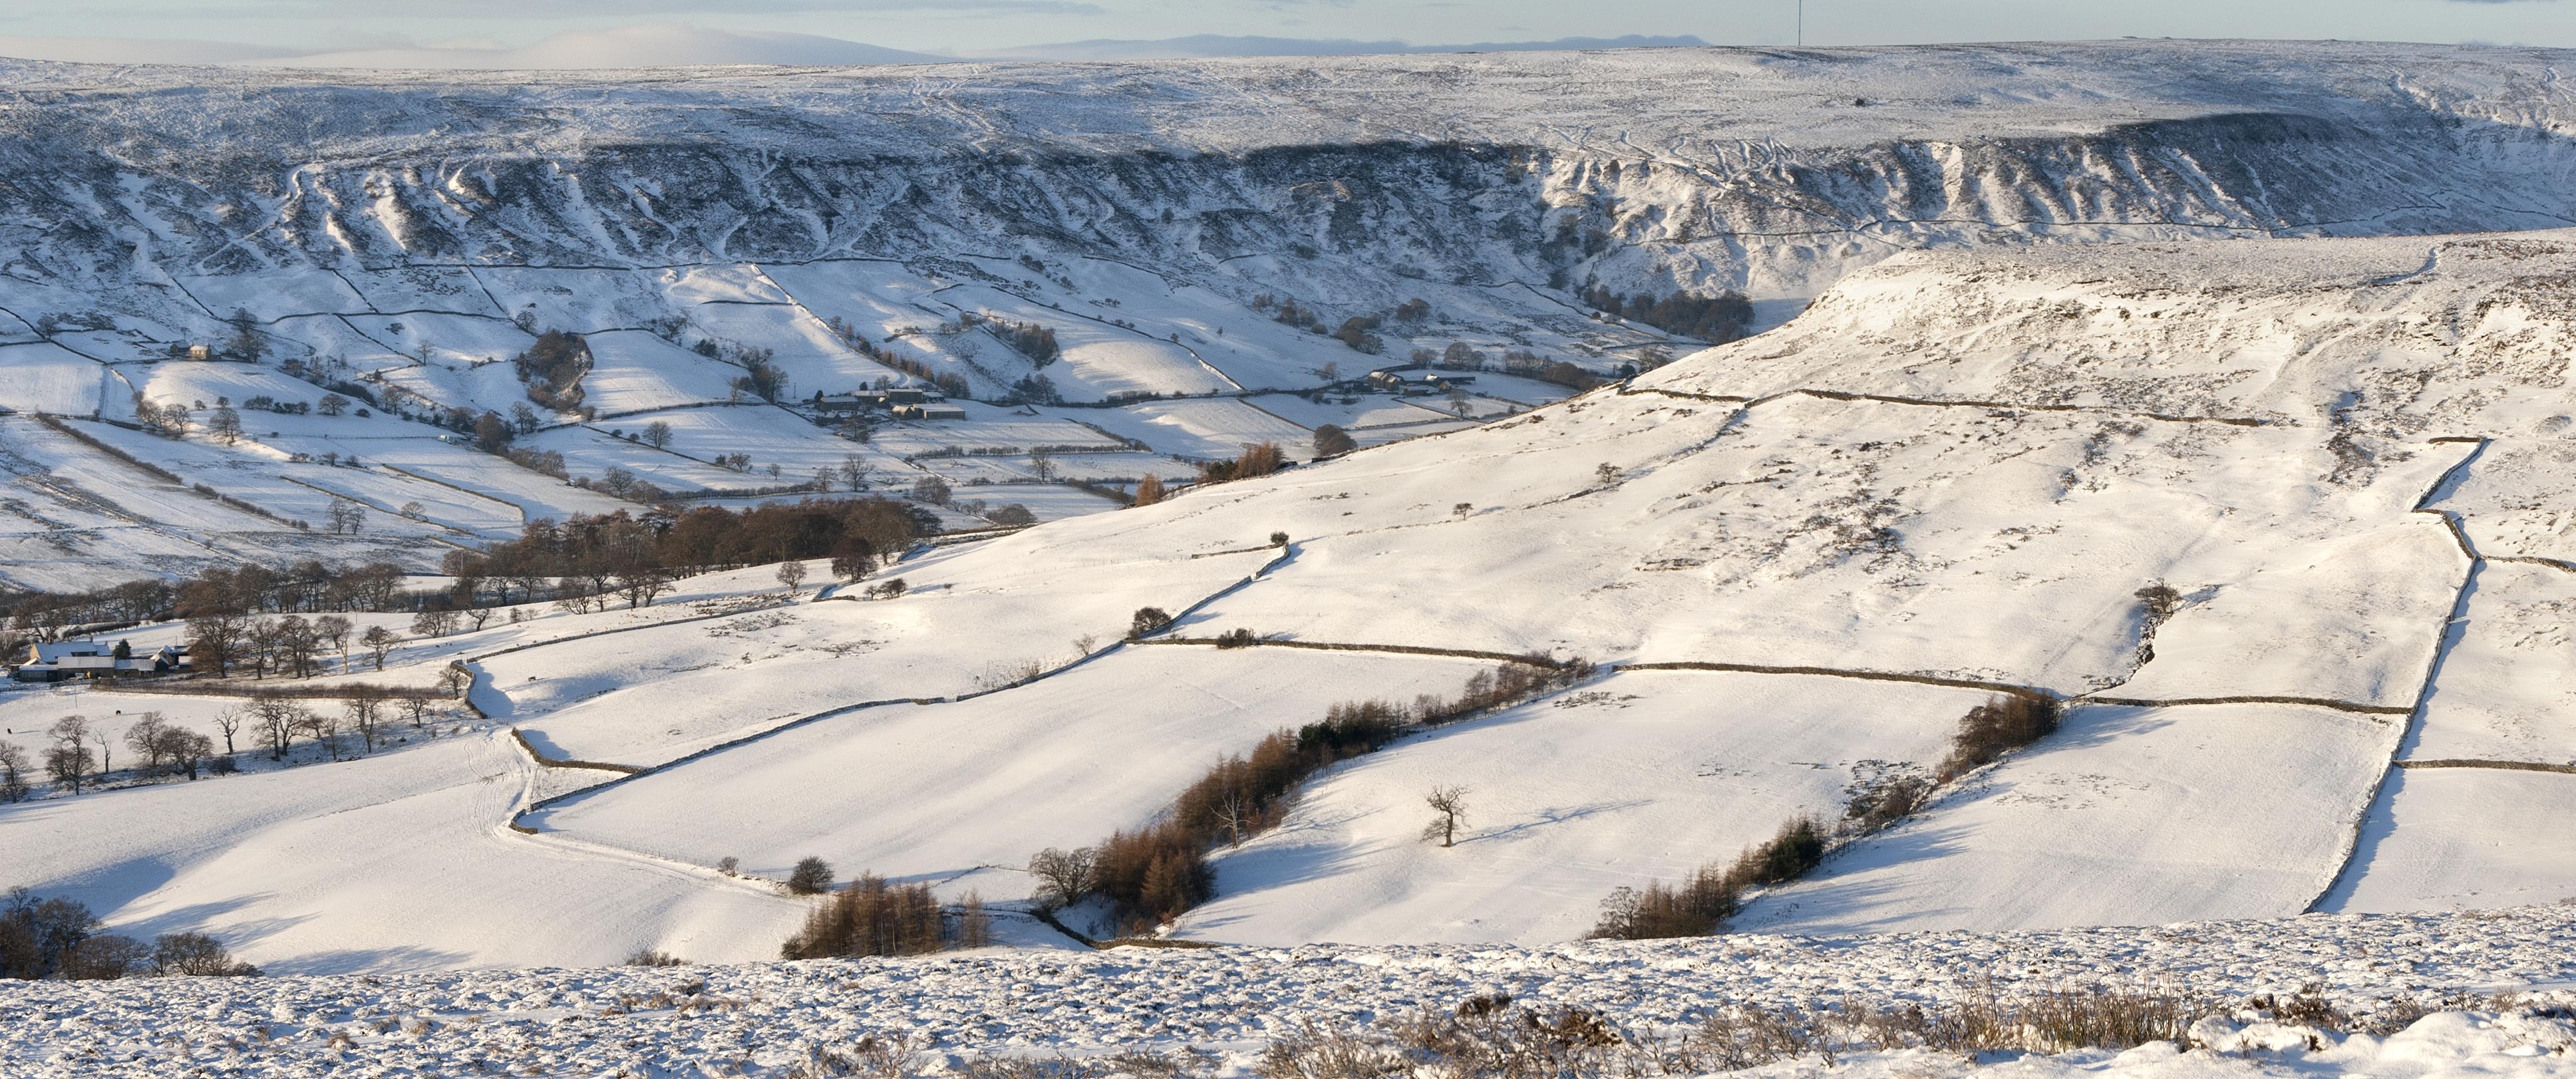 Stunning winter scenery North York Moors